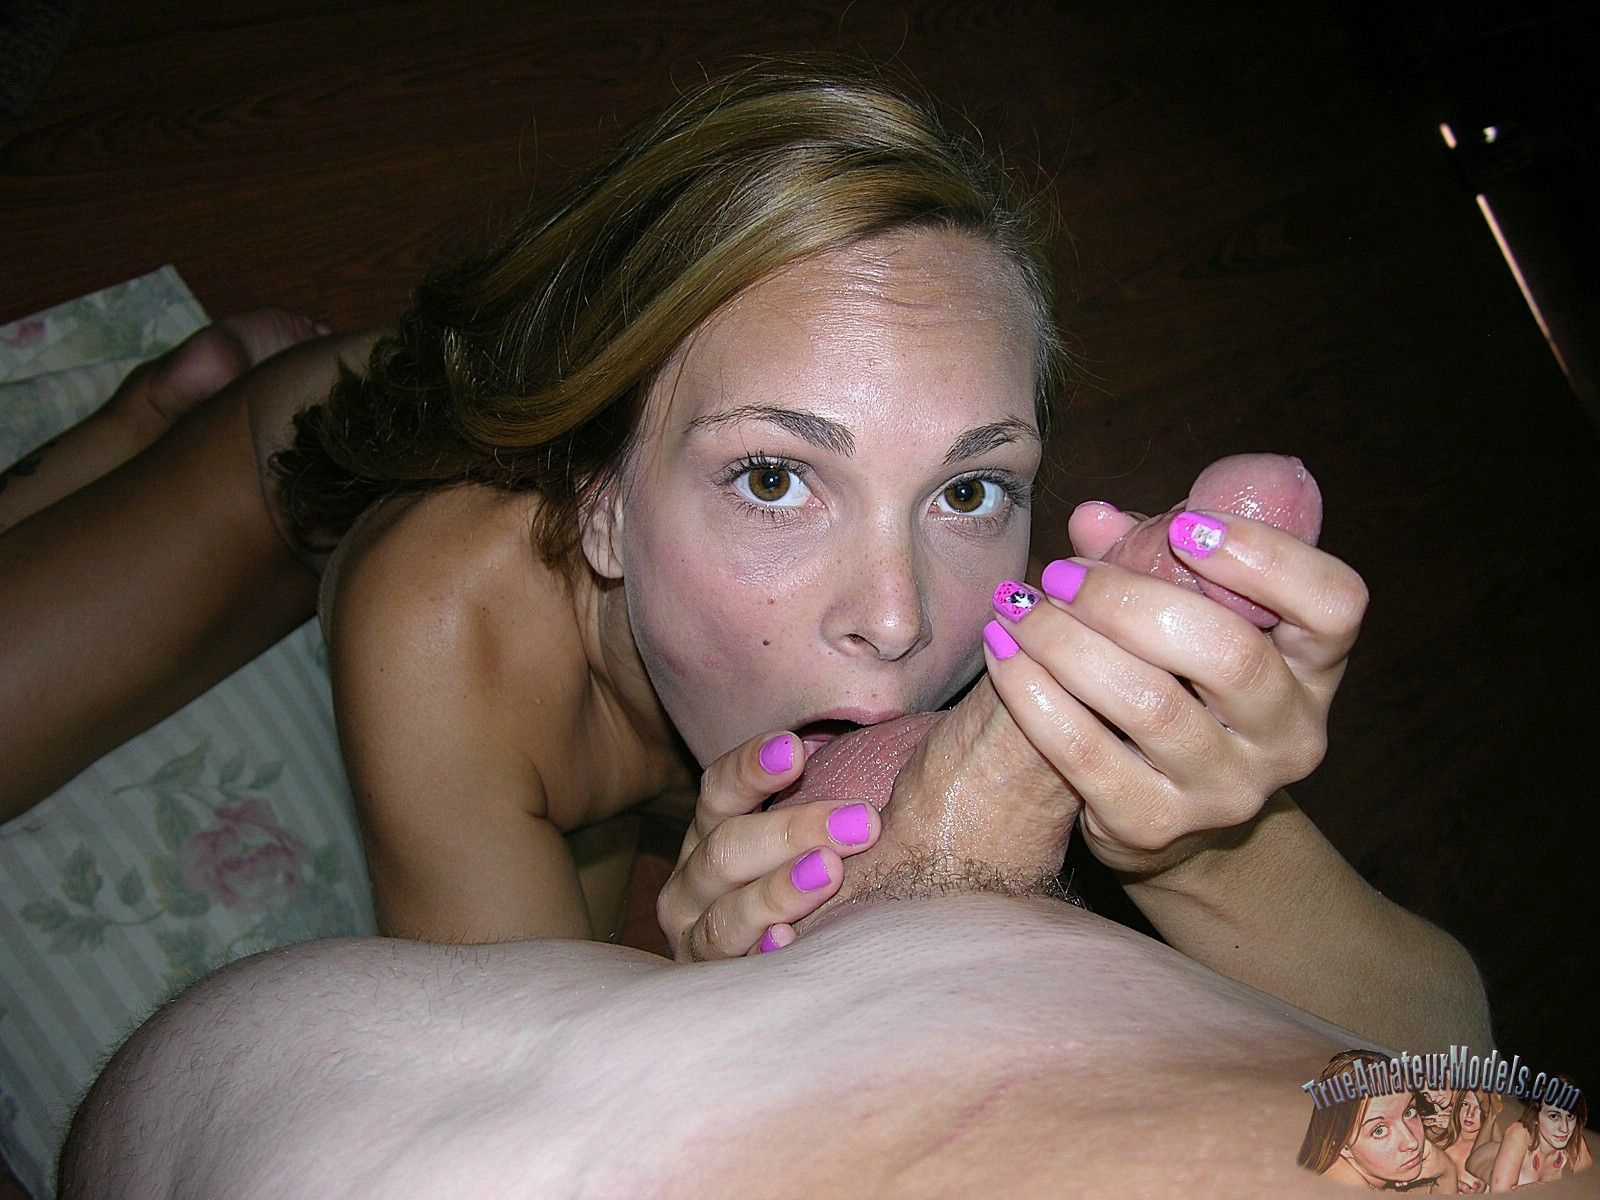 Butt slut handjob penis and anal